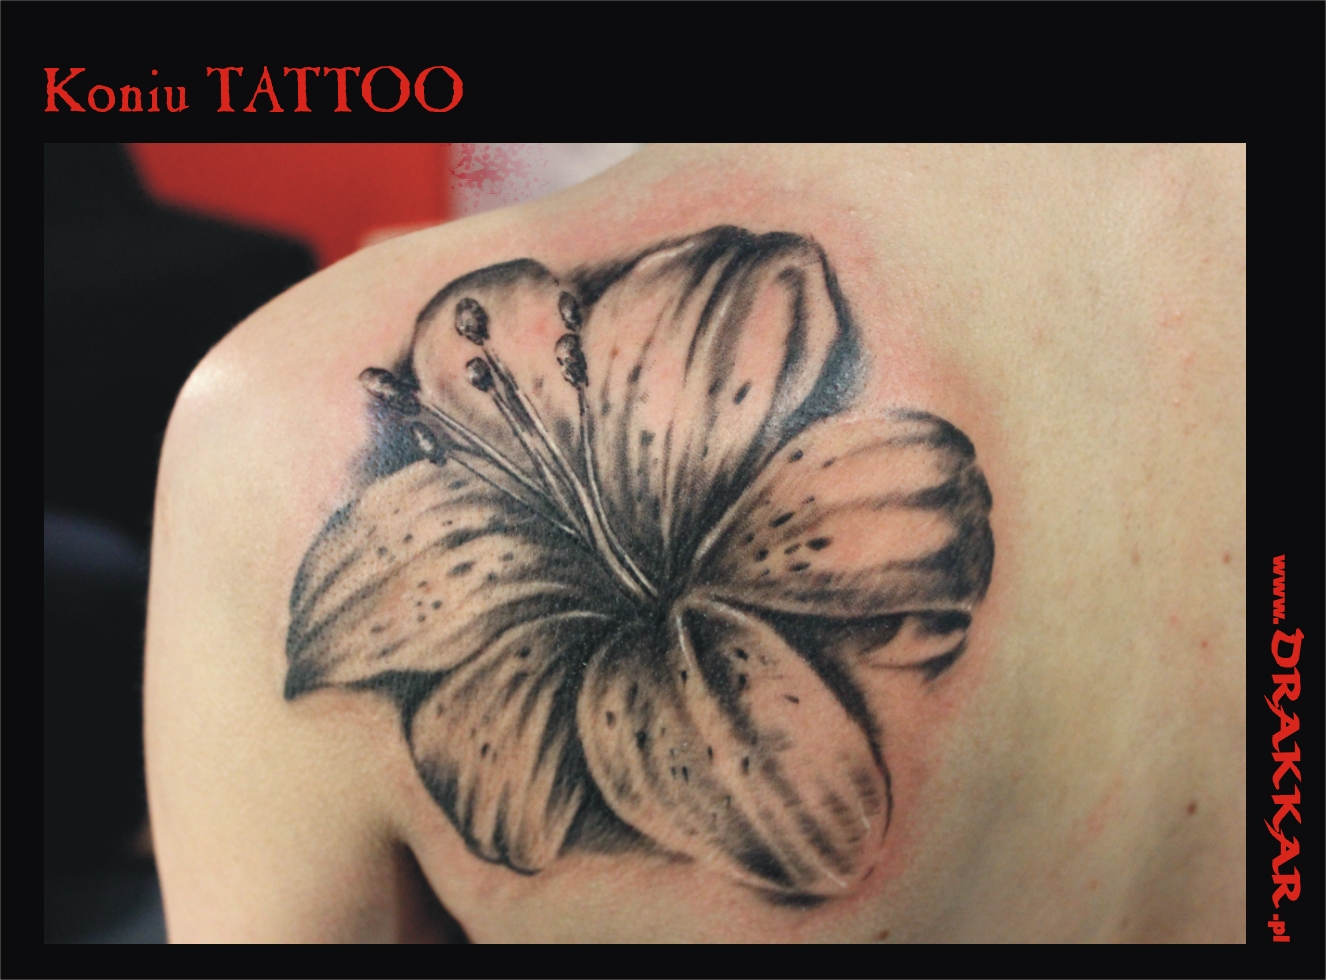 tatuaż z kwiatem, studio tatuażu Śląsk